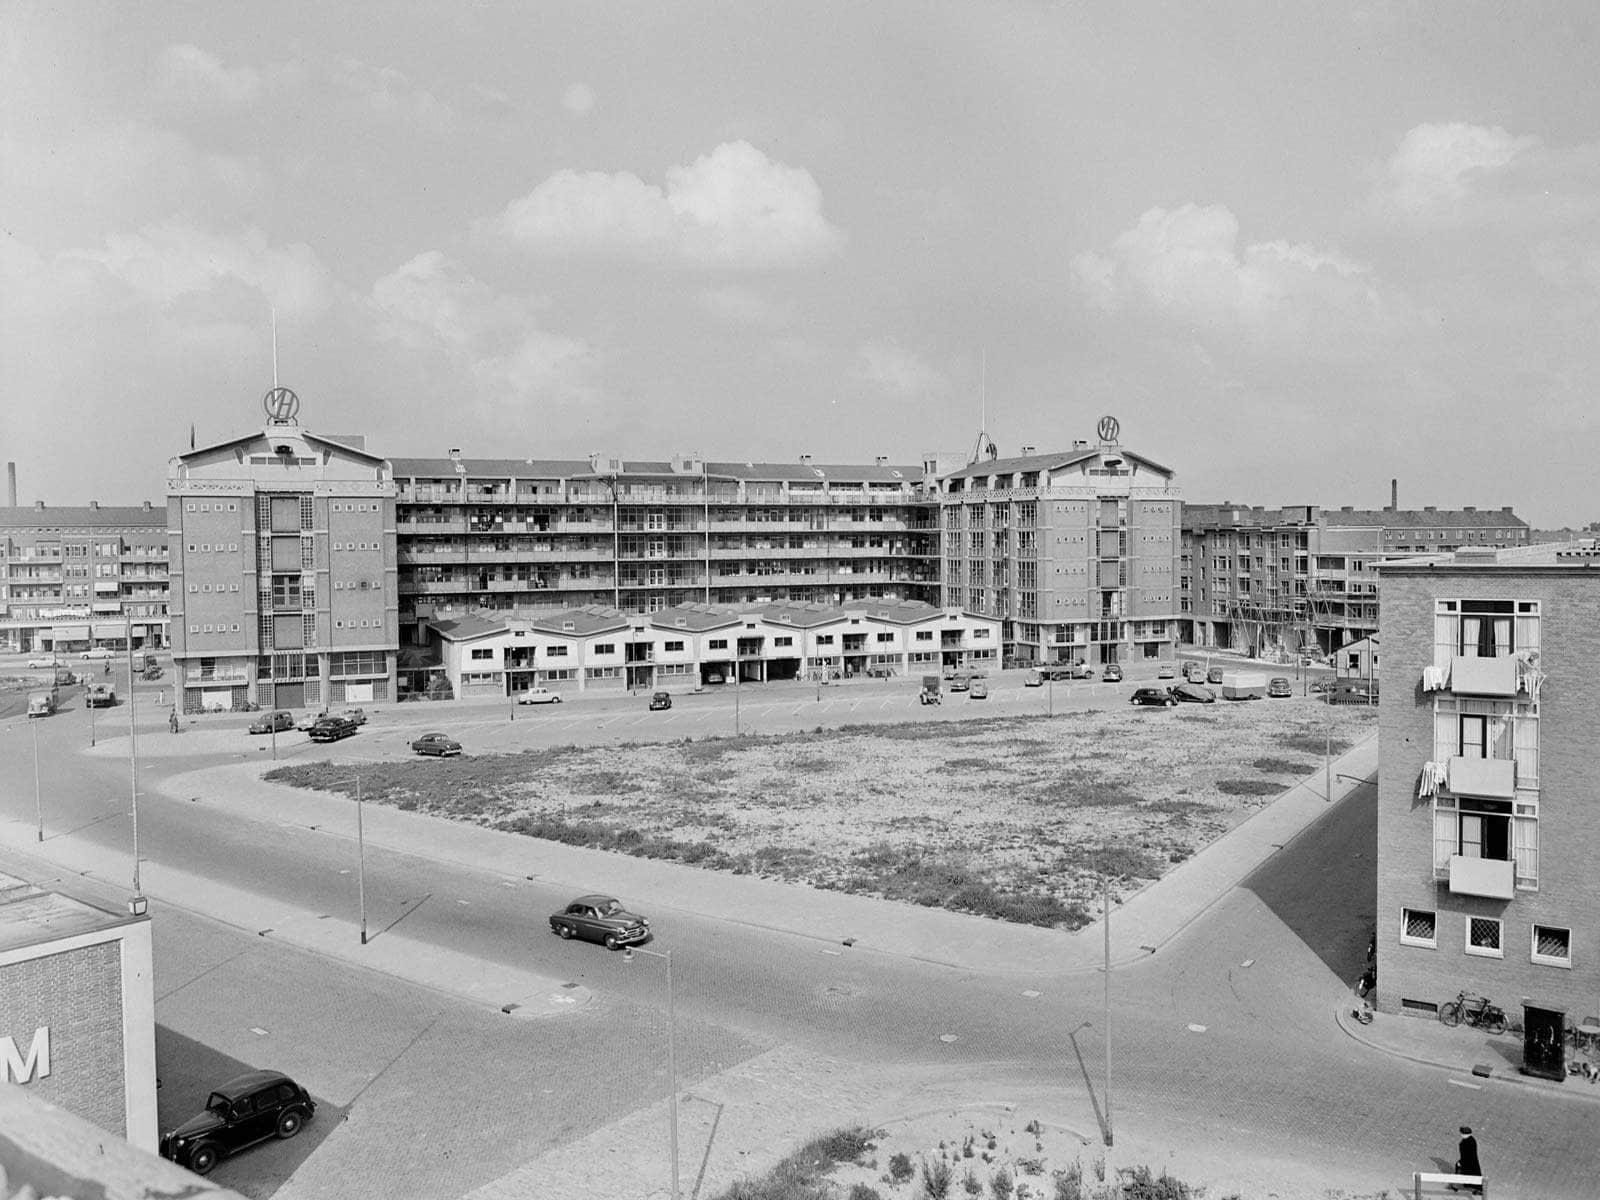 Stadsarchief Industriegebouw Exterieur